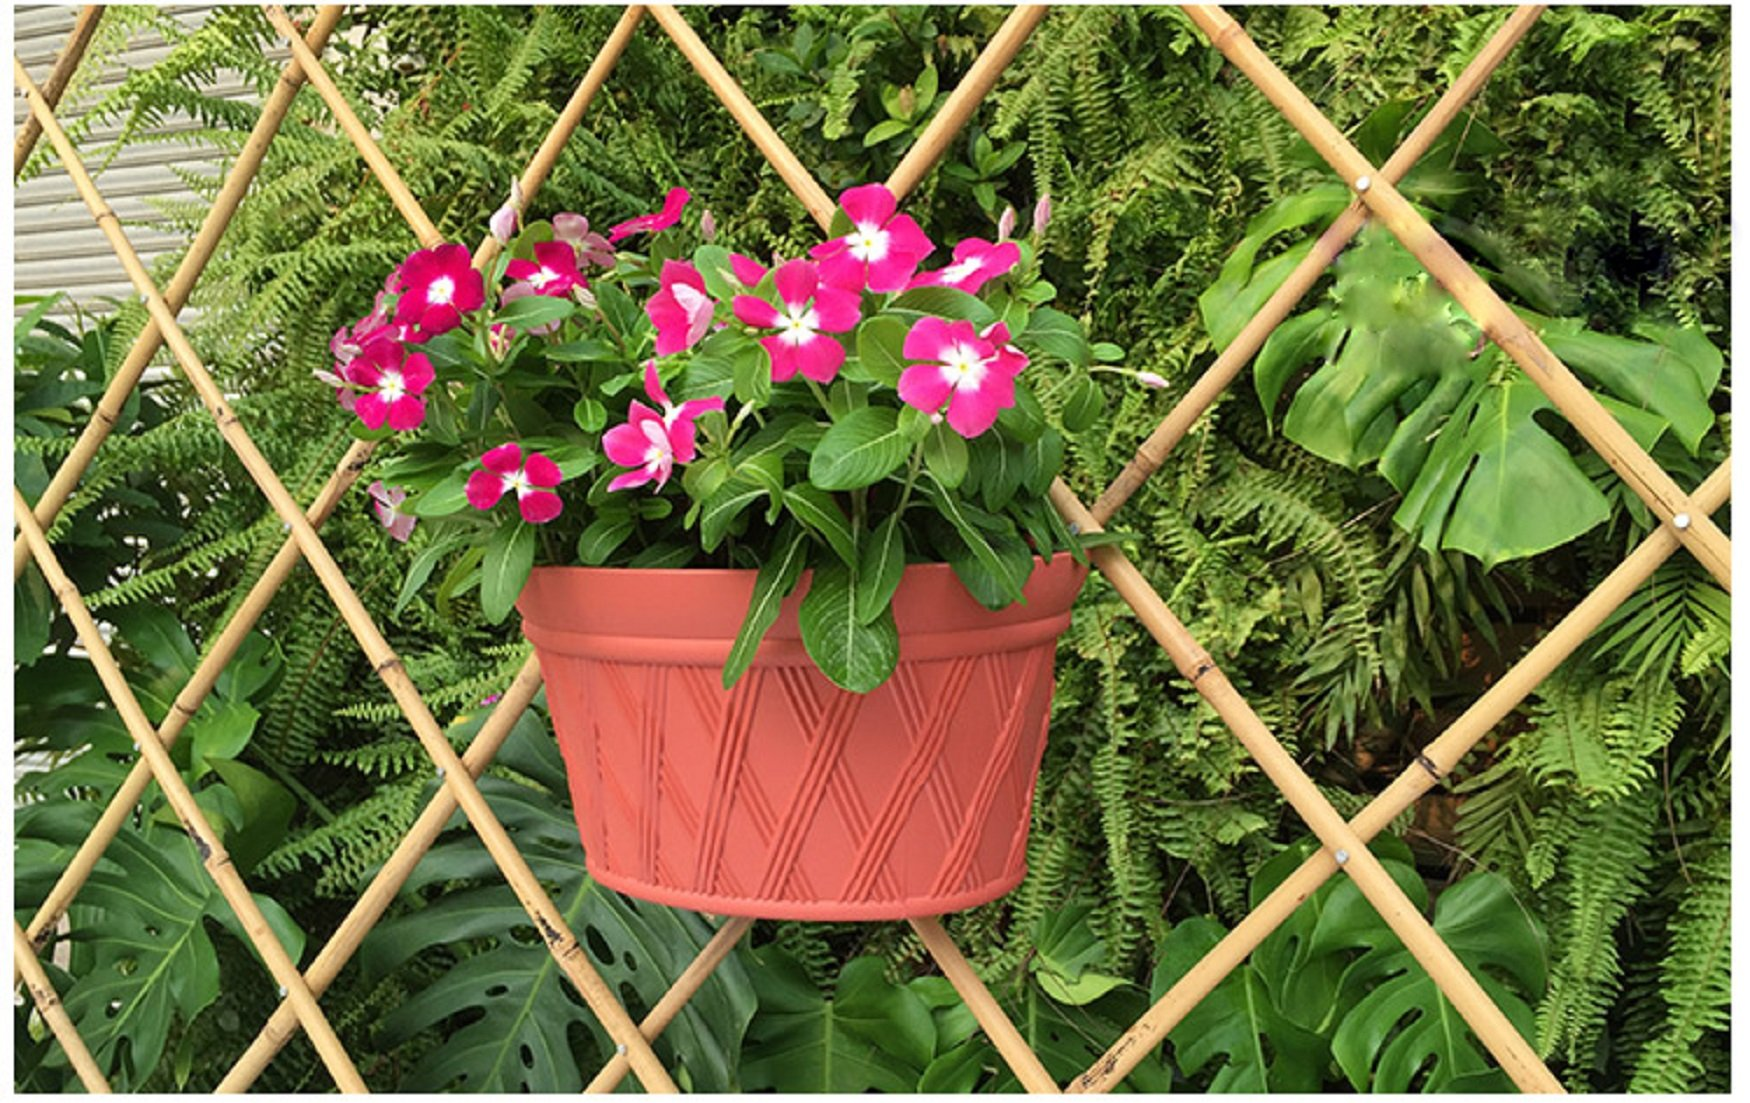 Mr. Garden 12 Inch Plastic Wall-Mounted Planter, Brick Red x1, Green x1, Light Grey x1